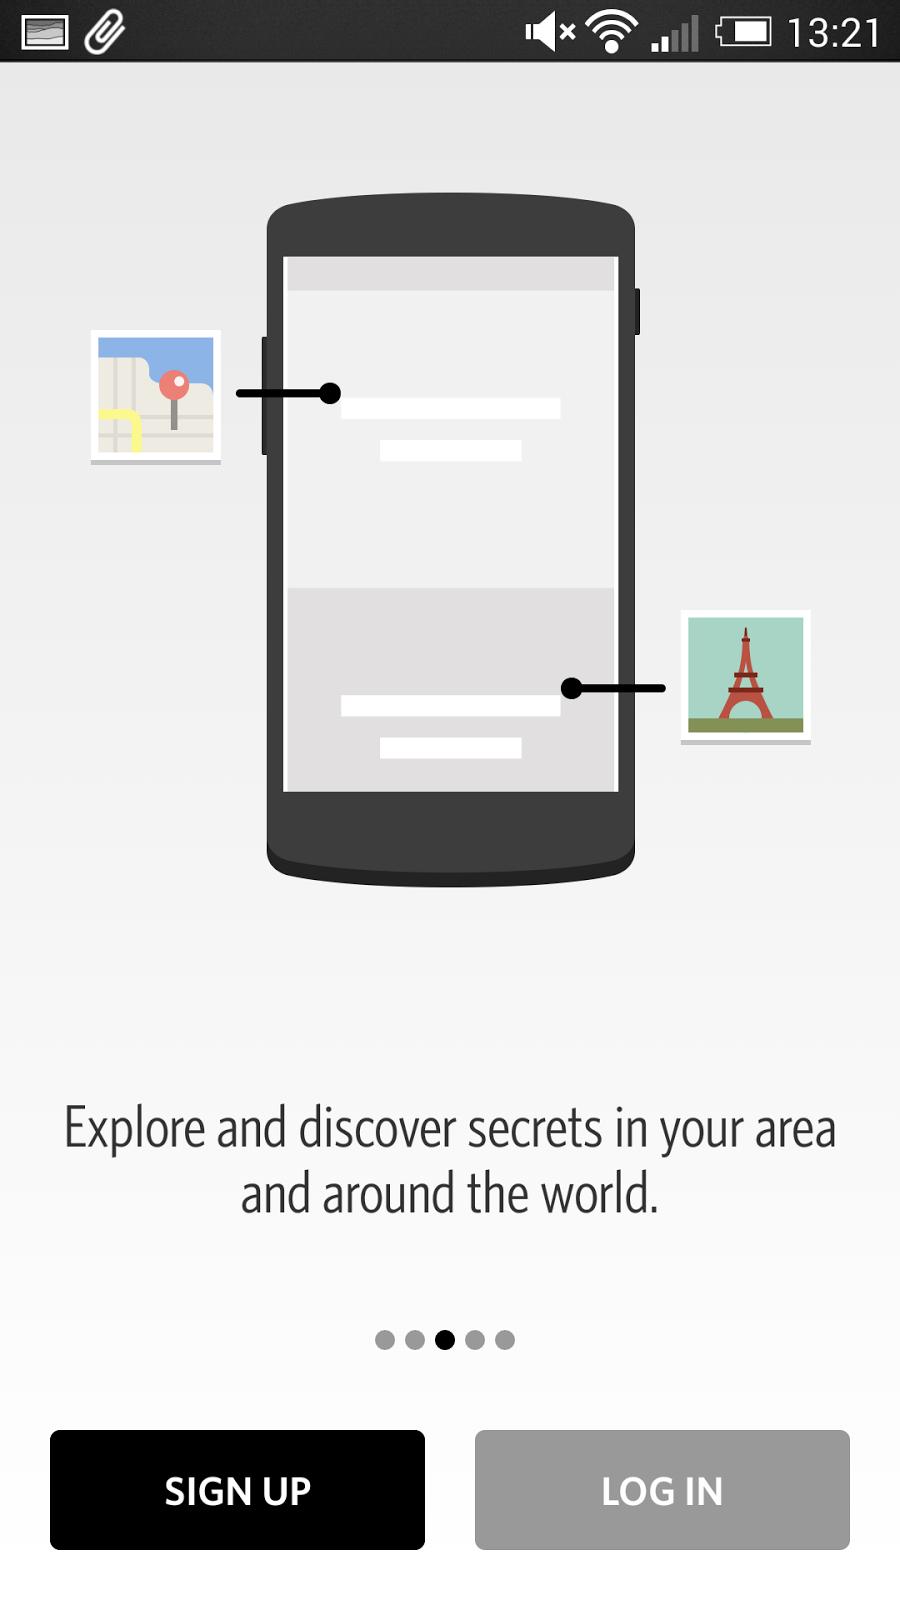 Secret 解除分享焦慮的社交 App ,對朋友匿名寫真心話 secret-02